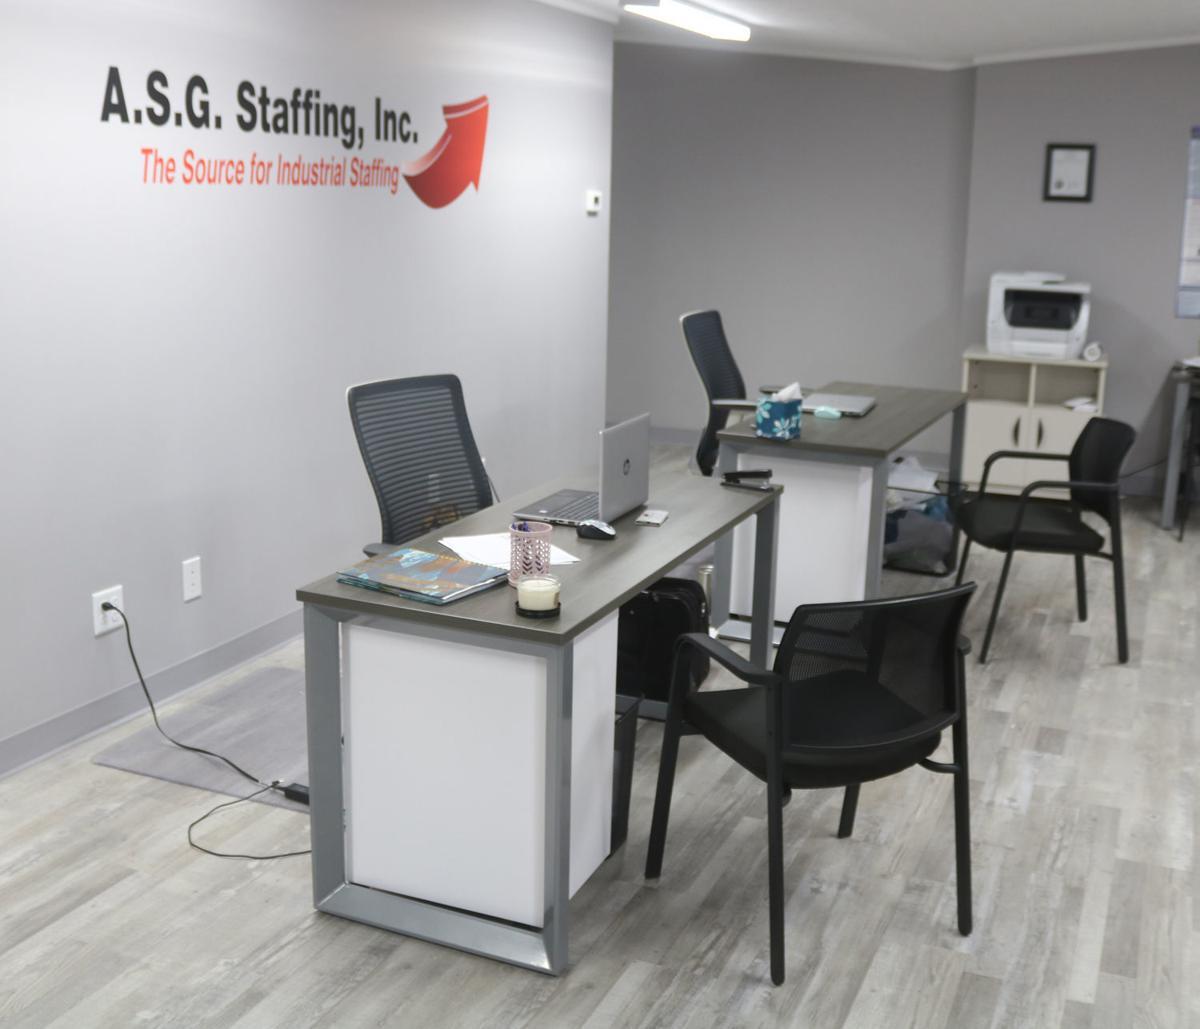 ASG Staffing interior